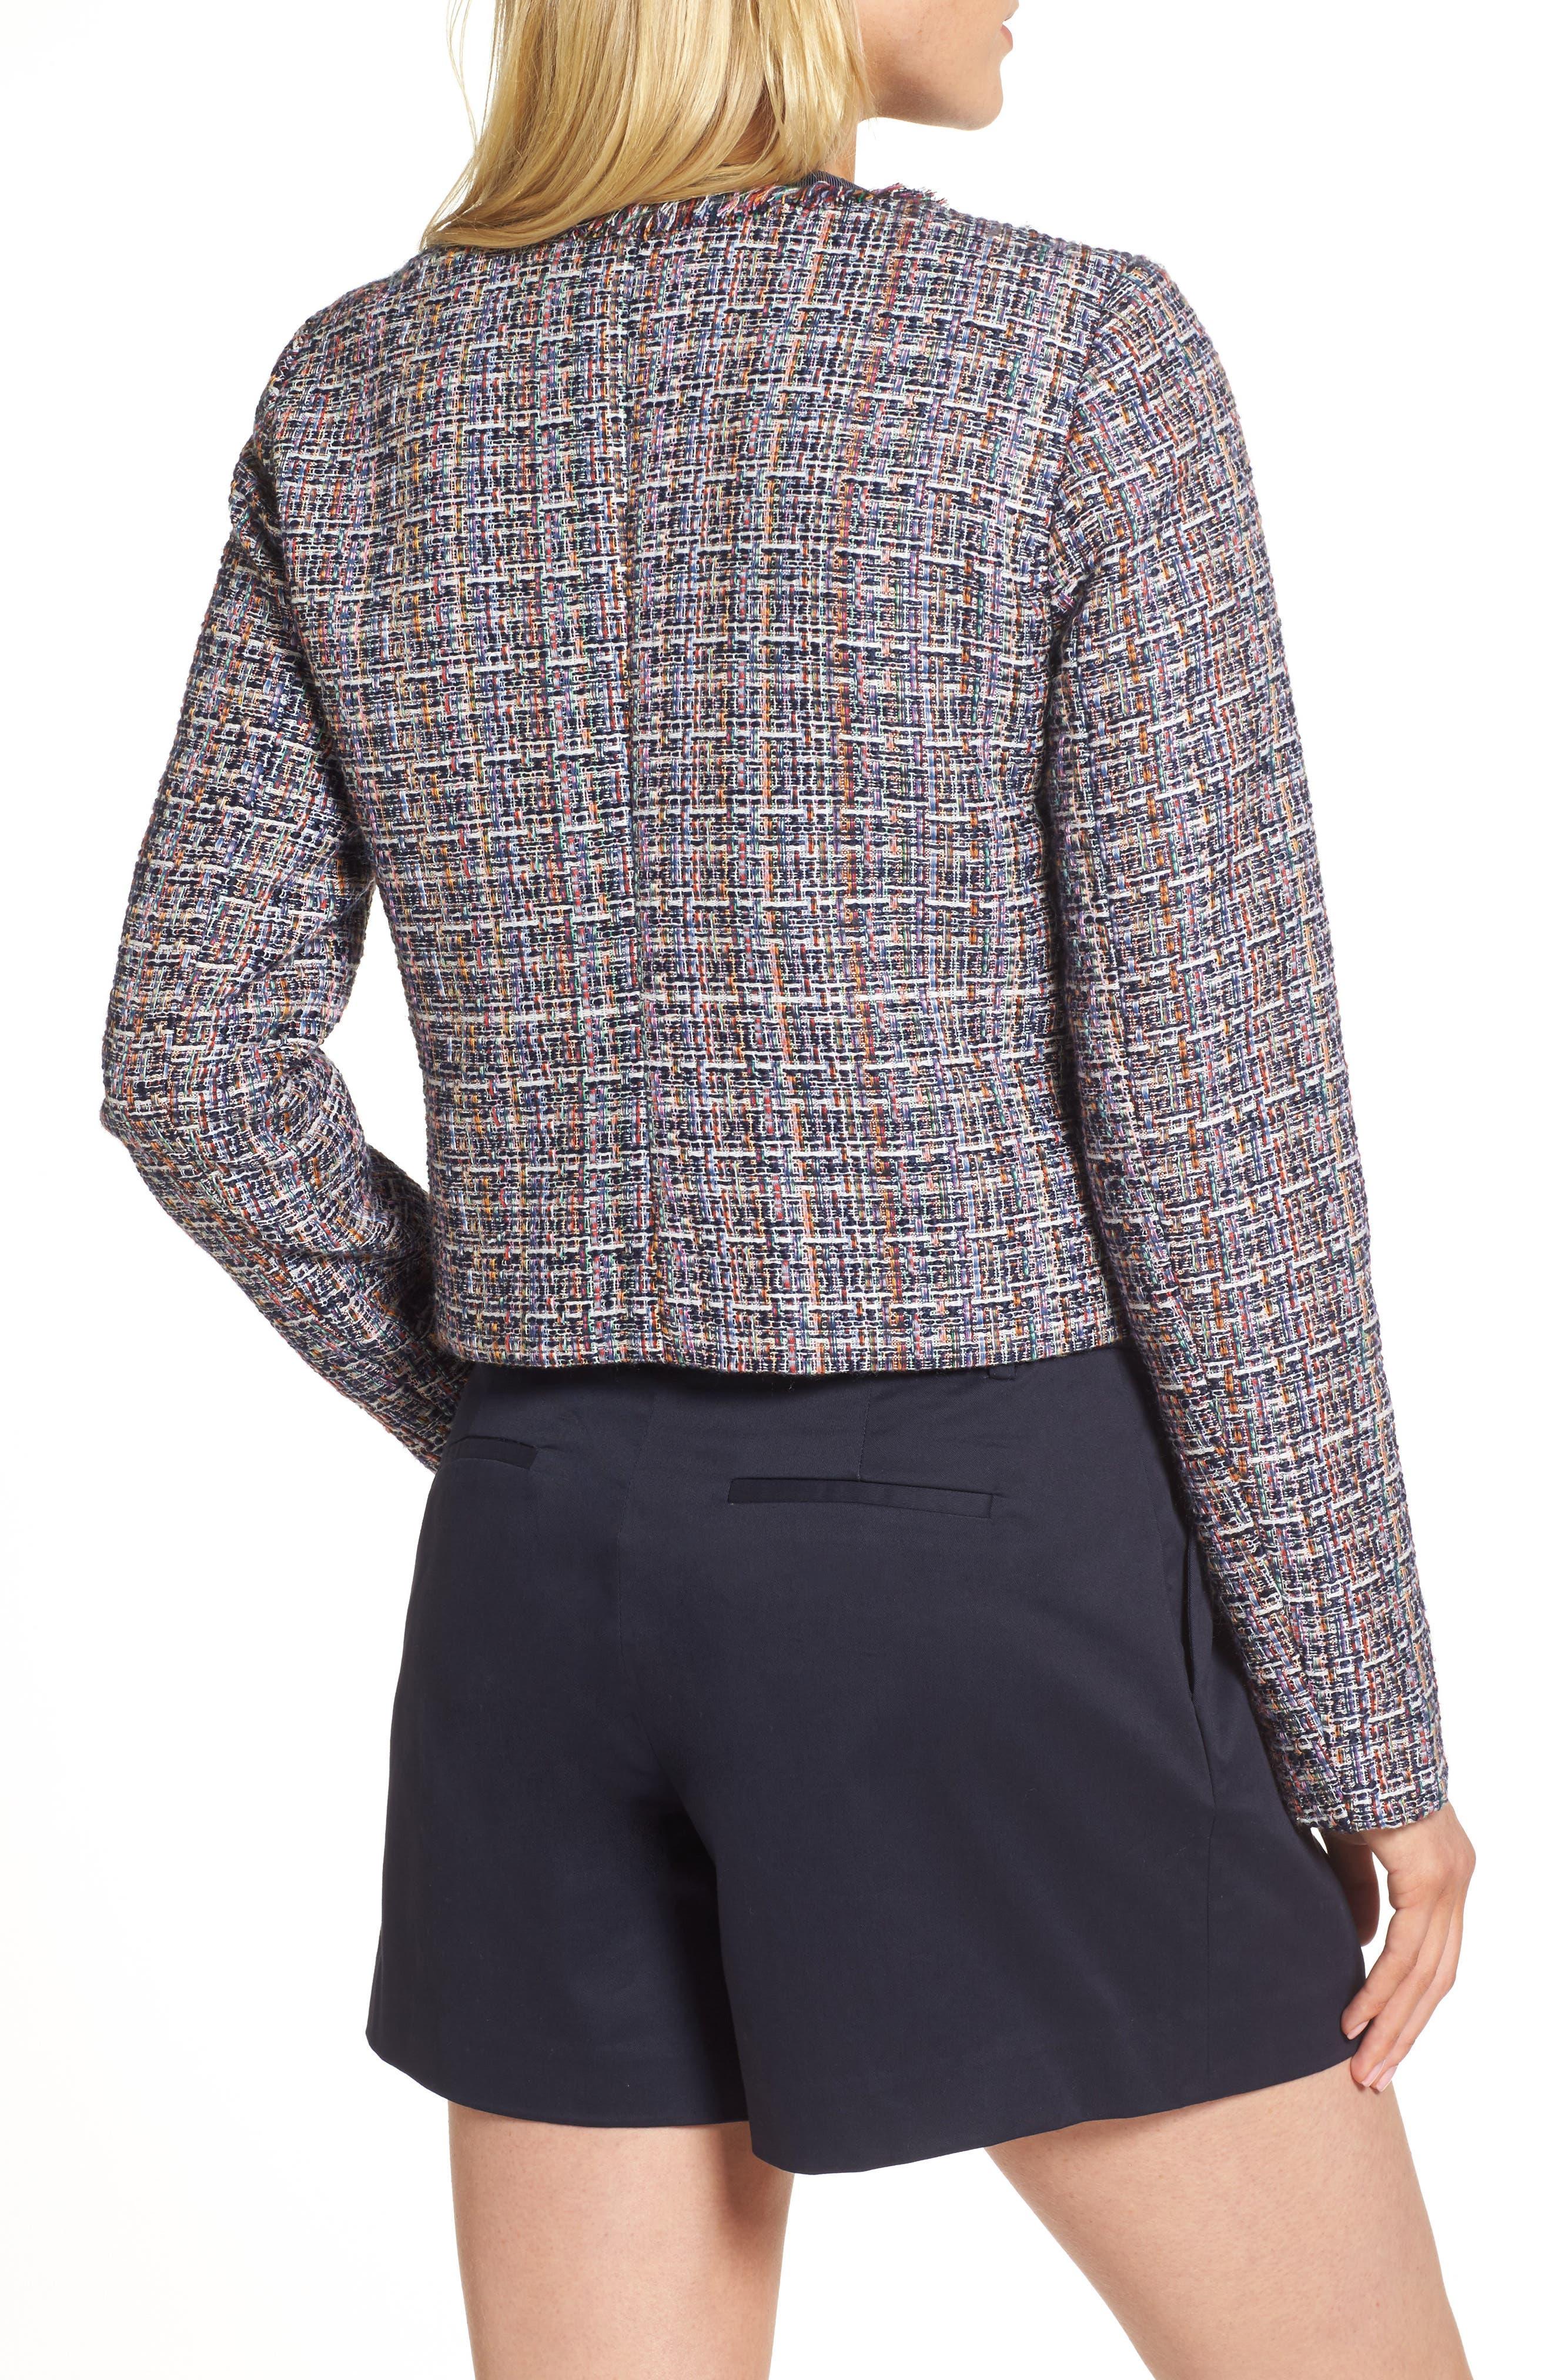 Alternate Image 2  - 1901 Tweed Jacket